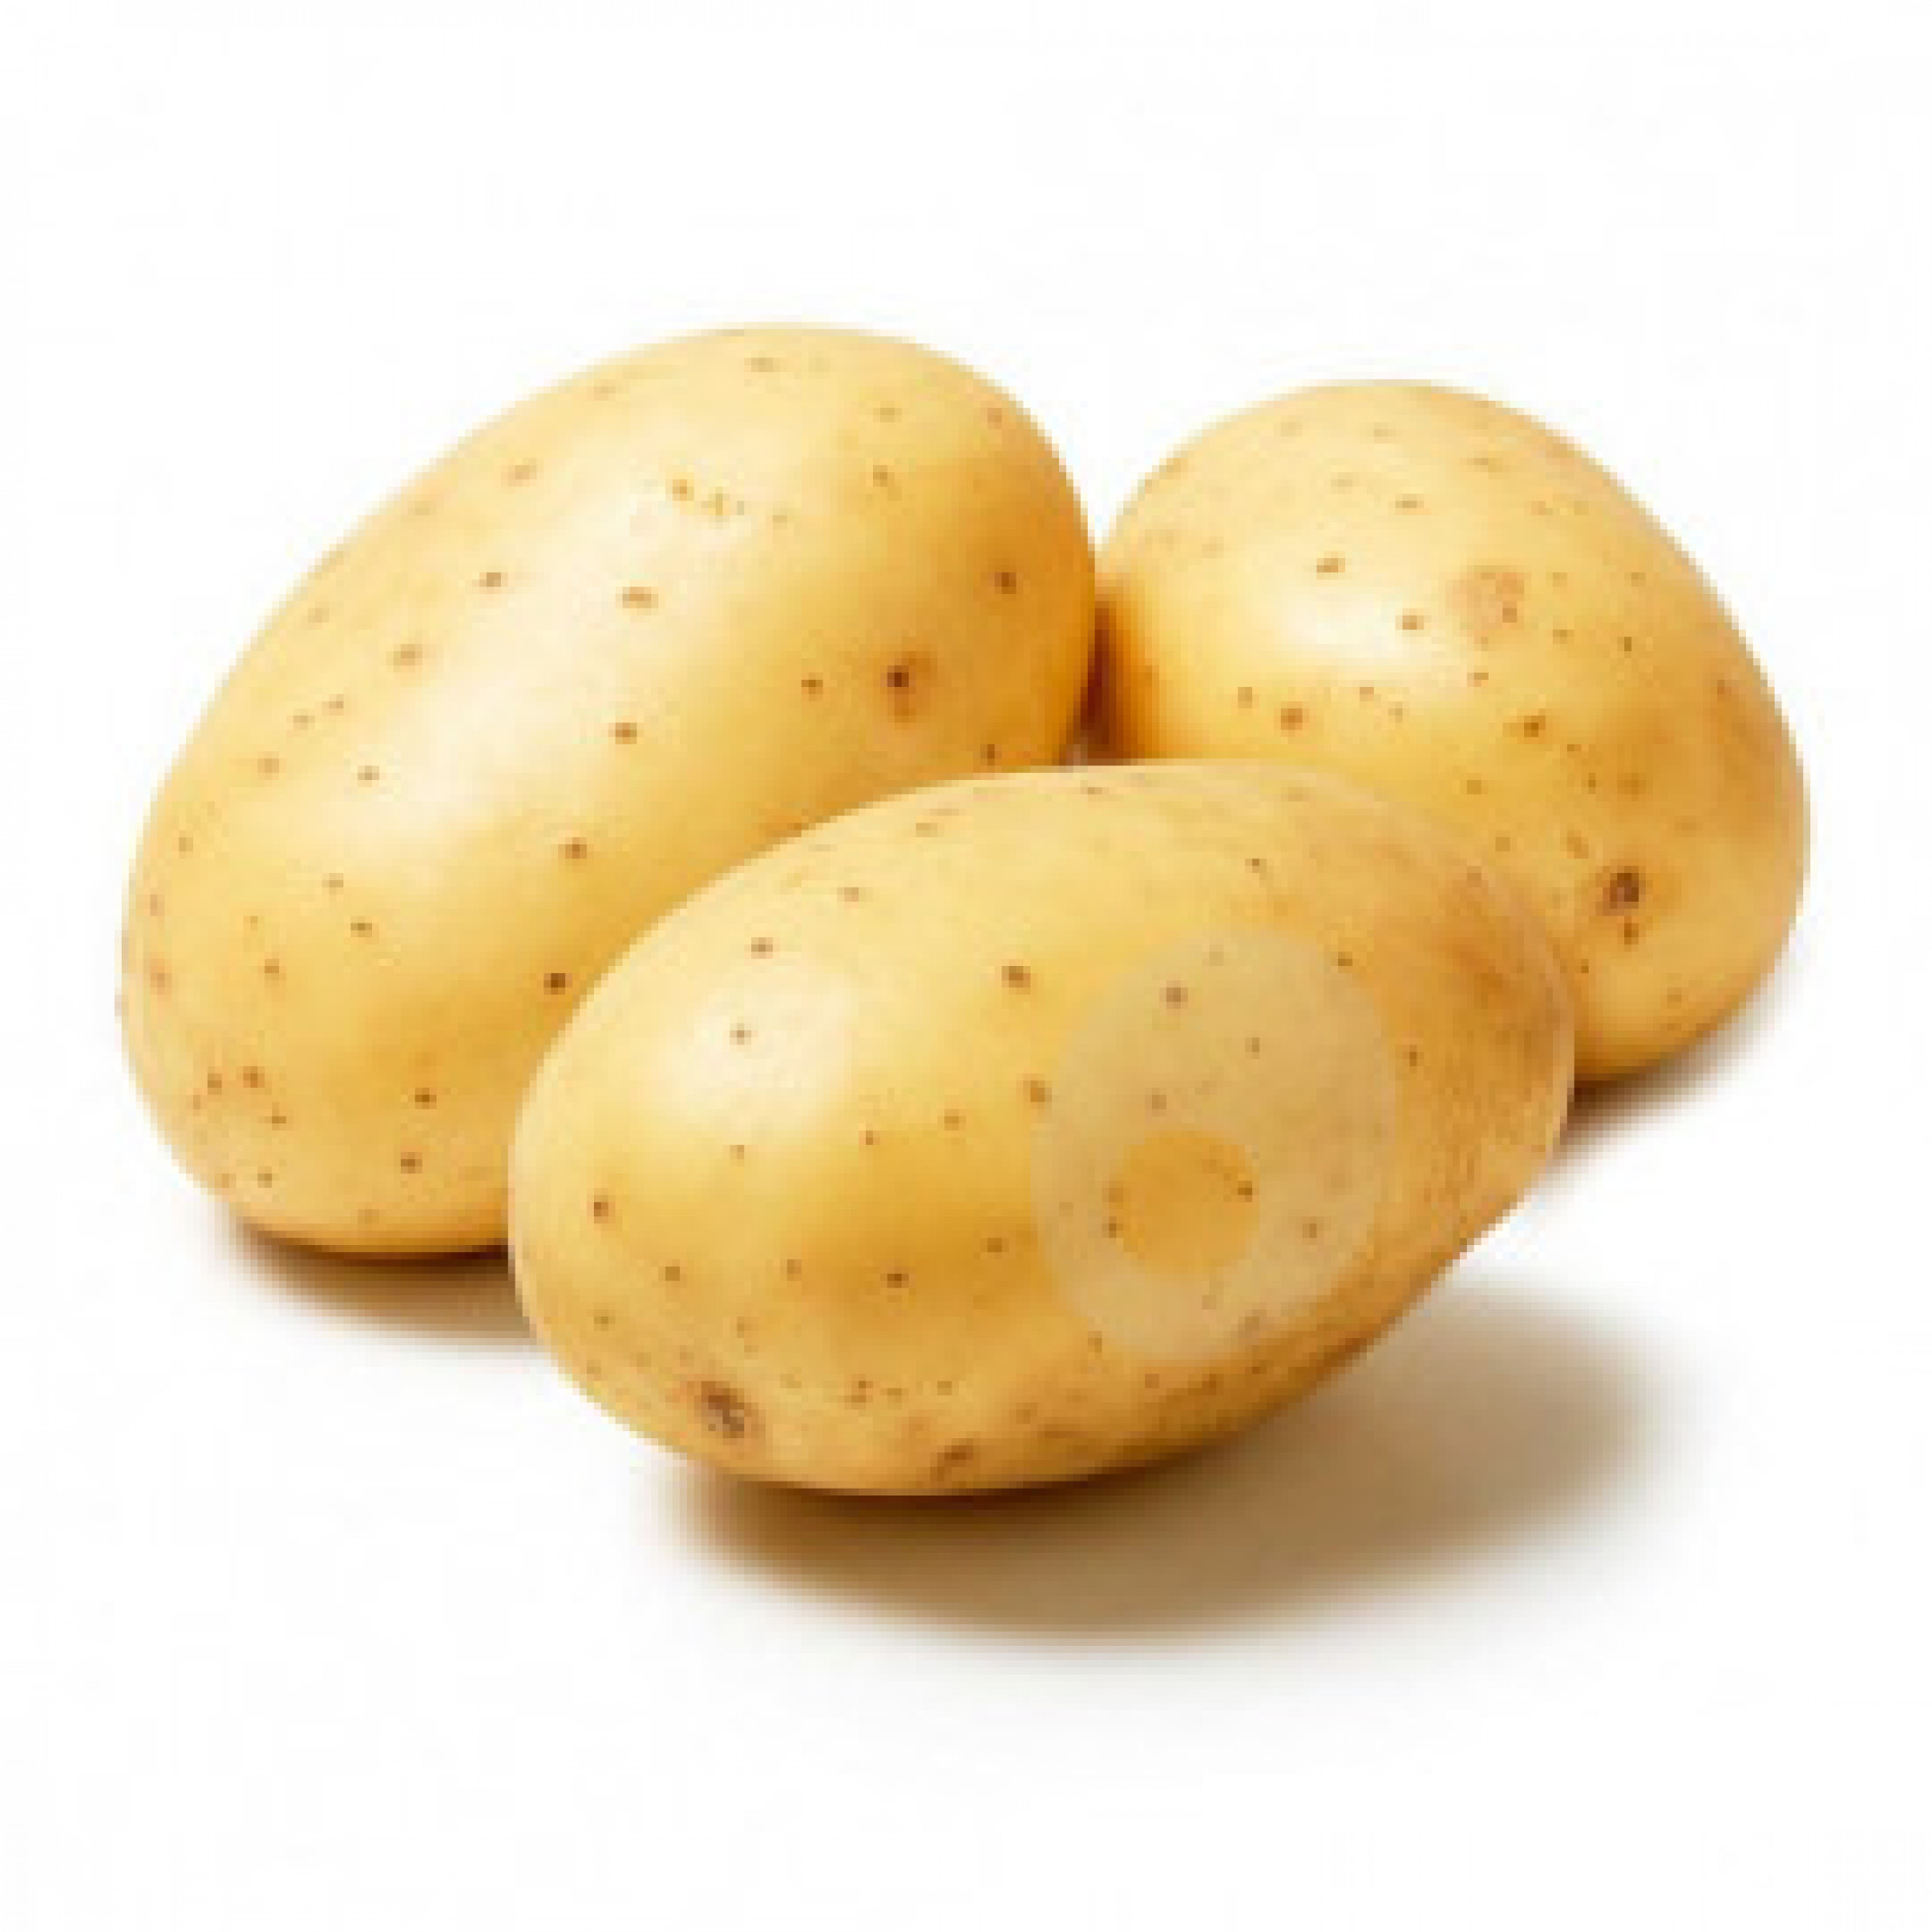 بطاطس